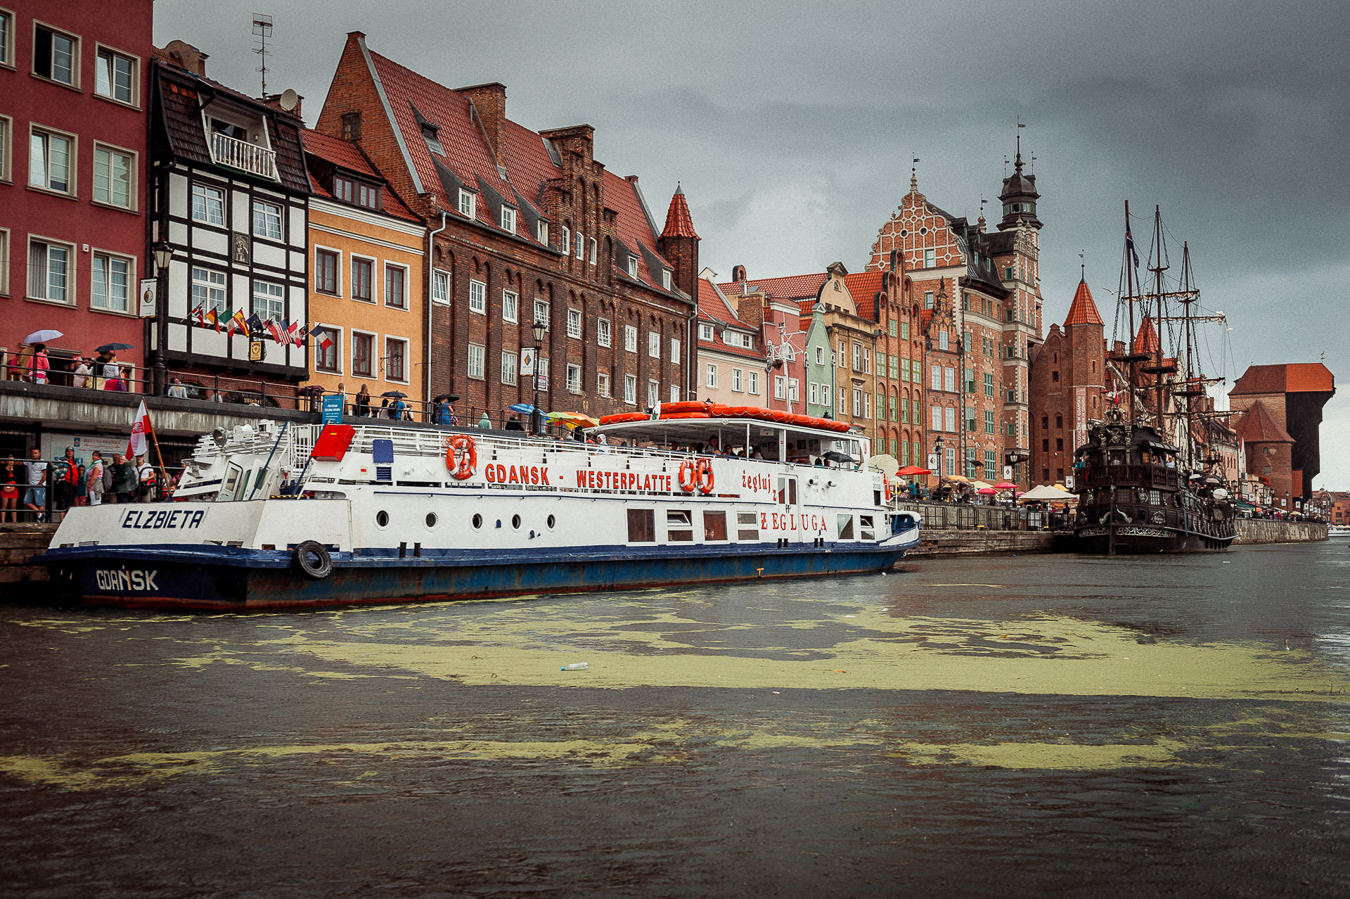 Żegluga Gdańska na Motławie